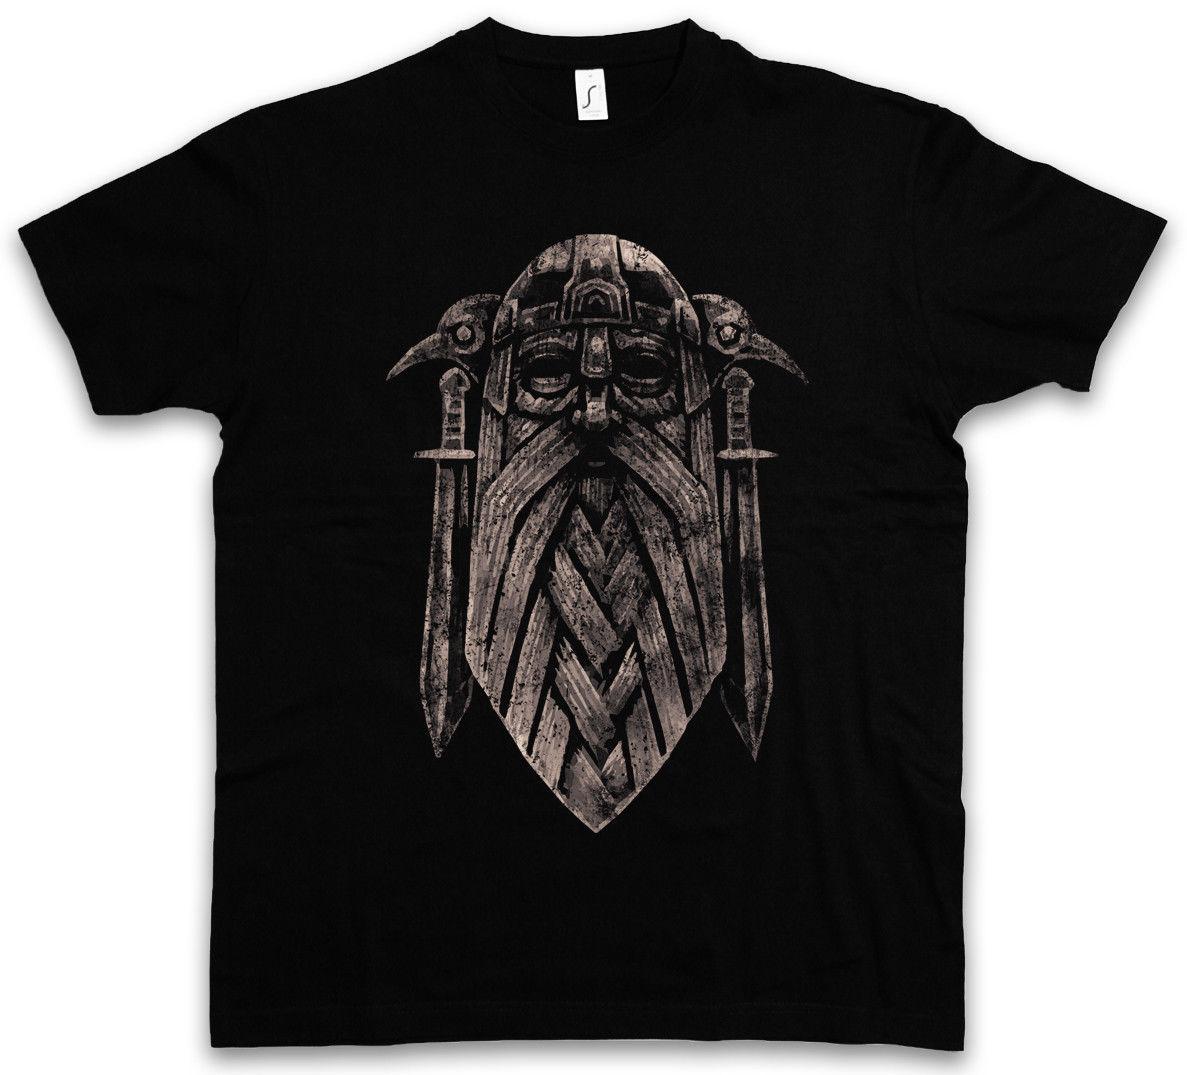 Short sleeve t shirt ODHIN IX T-SHIRT Valhalla Norse Vikings Odhin Odin Thor German Nors ...